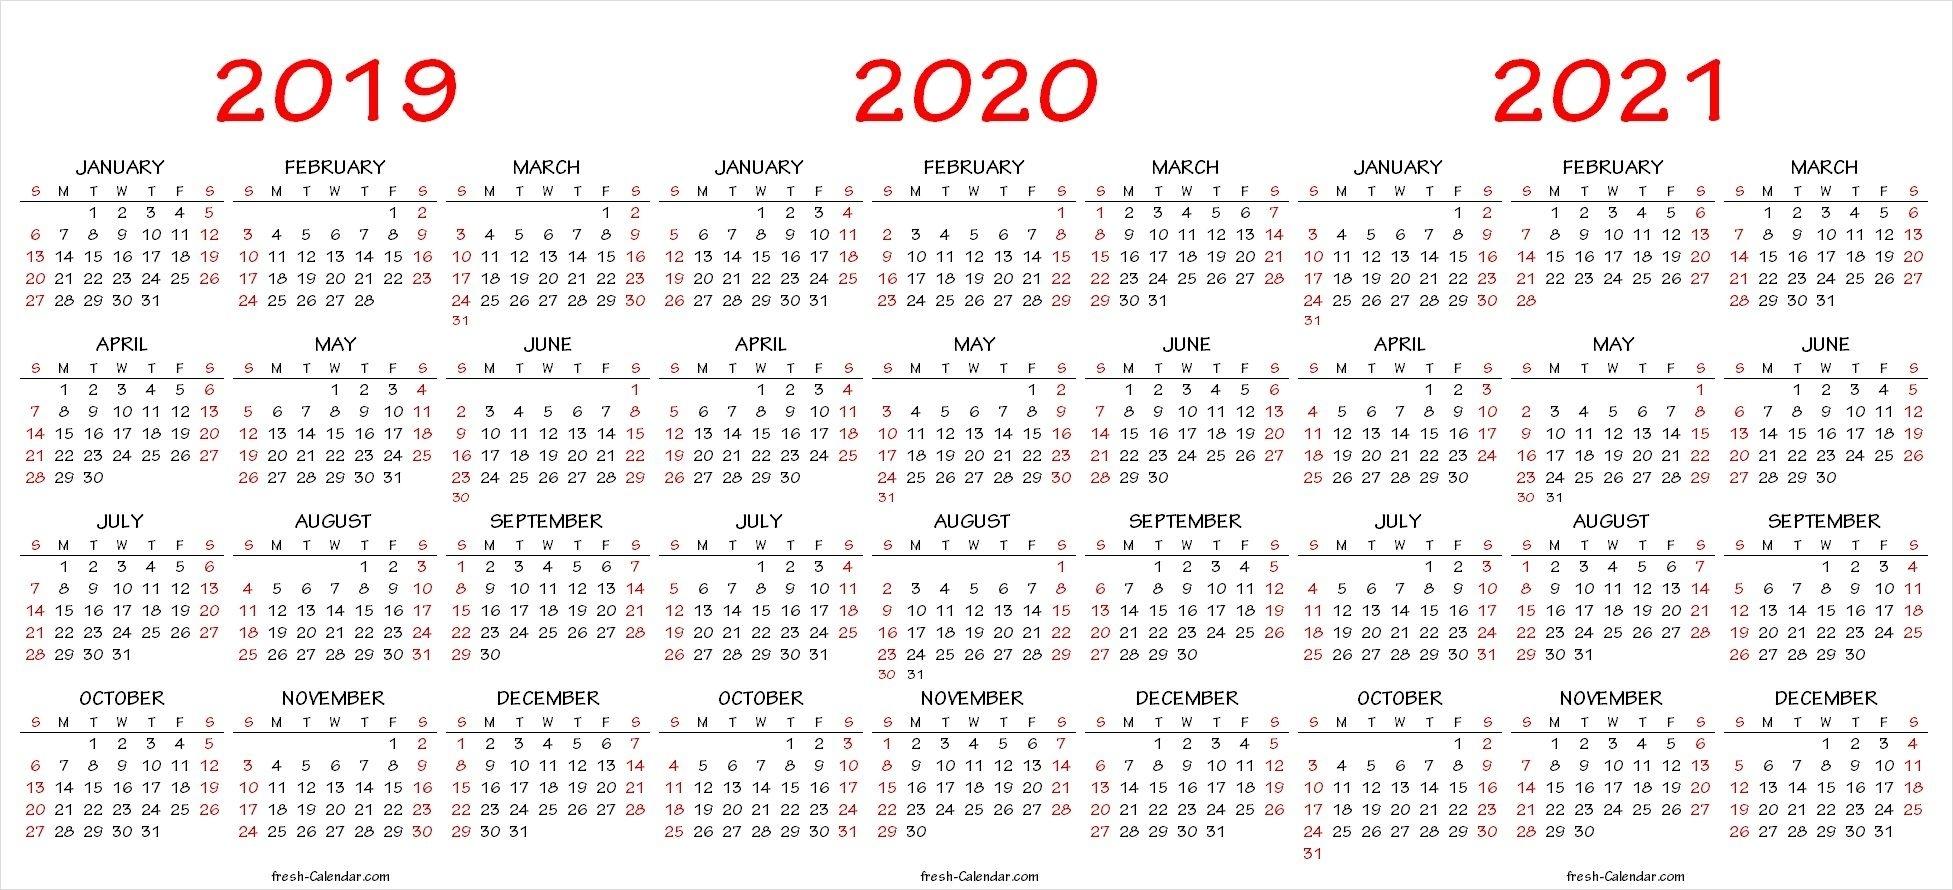 2019 2020 2021 Calendar Pdf Template   Calendar Printables in 3 Year Calendar 2019 2020 2021 Printable